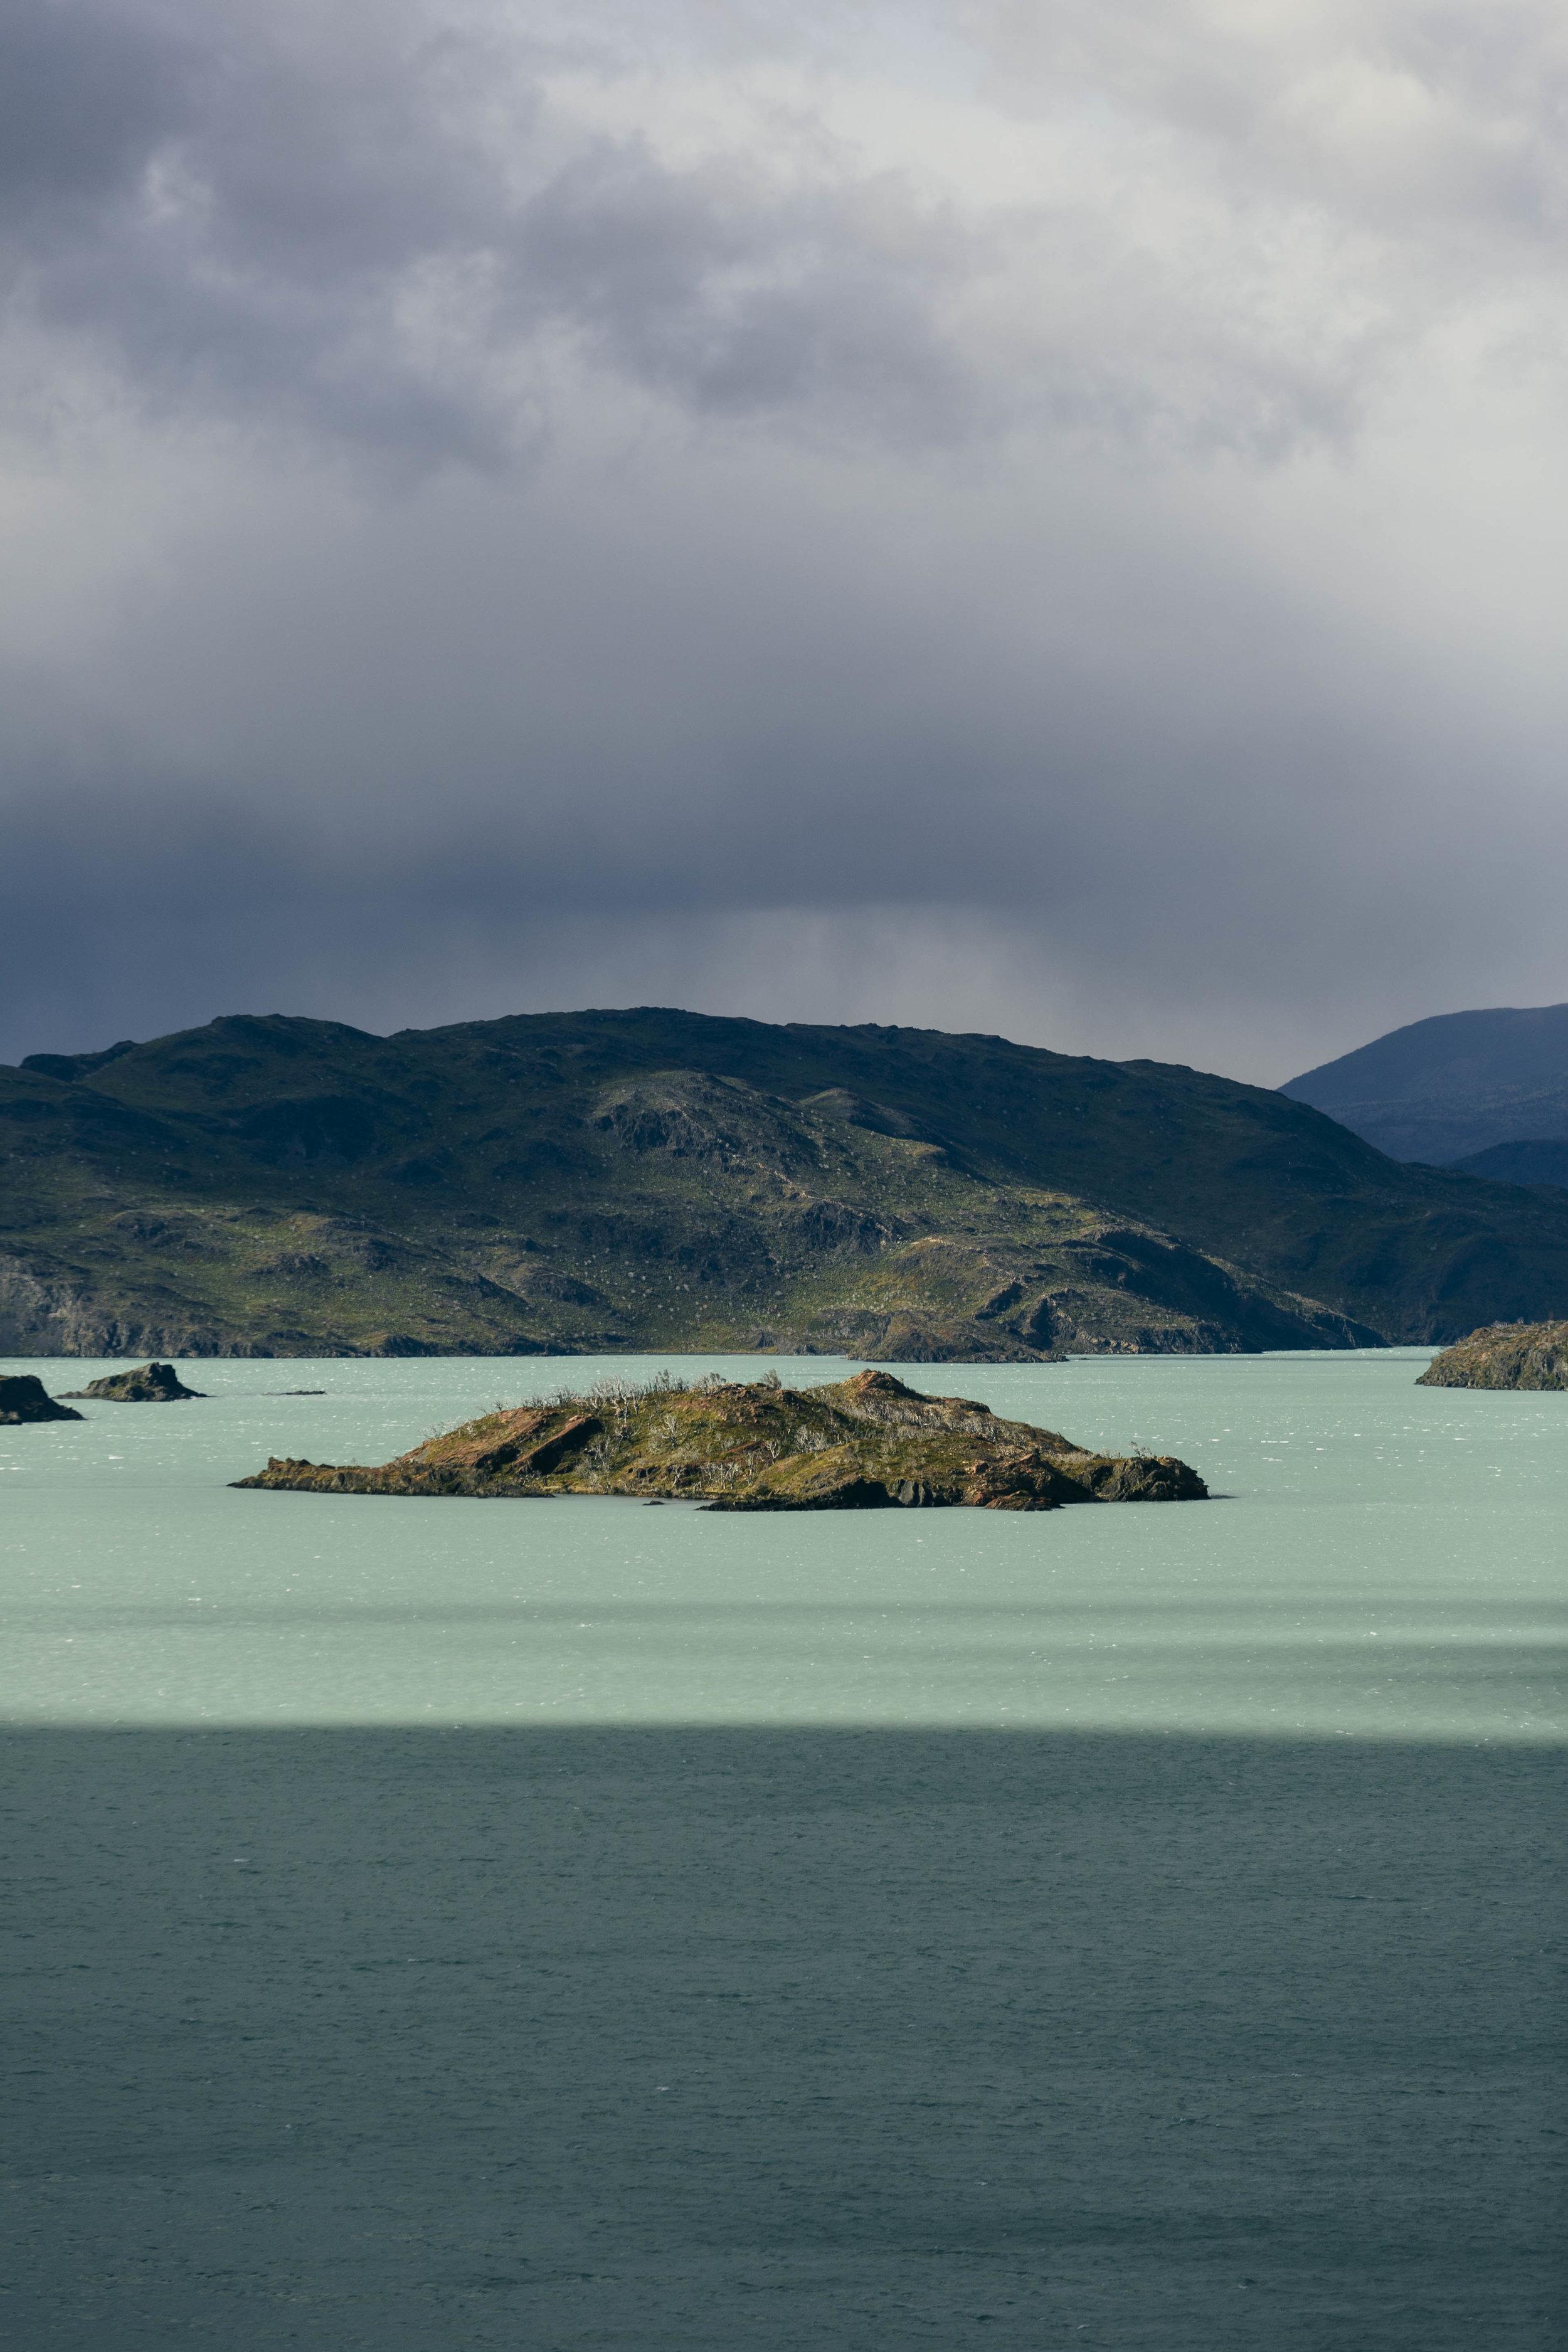 2015_patagonia_williedalton11A9C9766-2.jpg